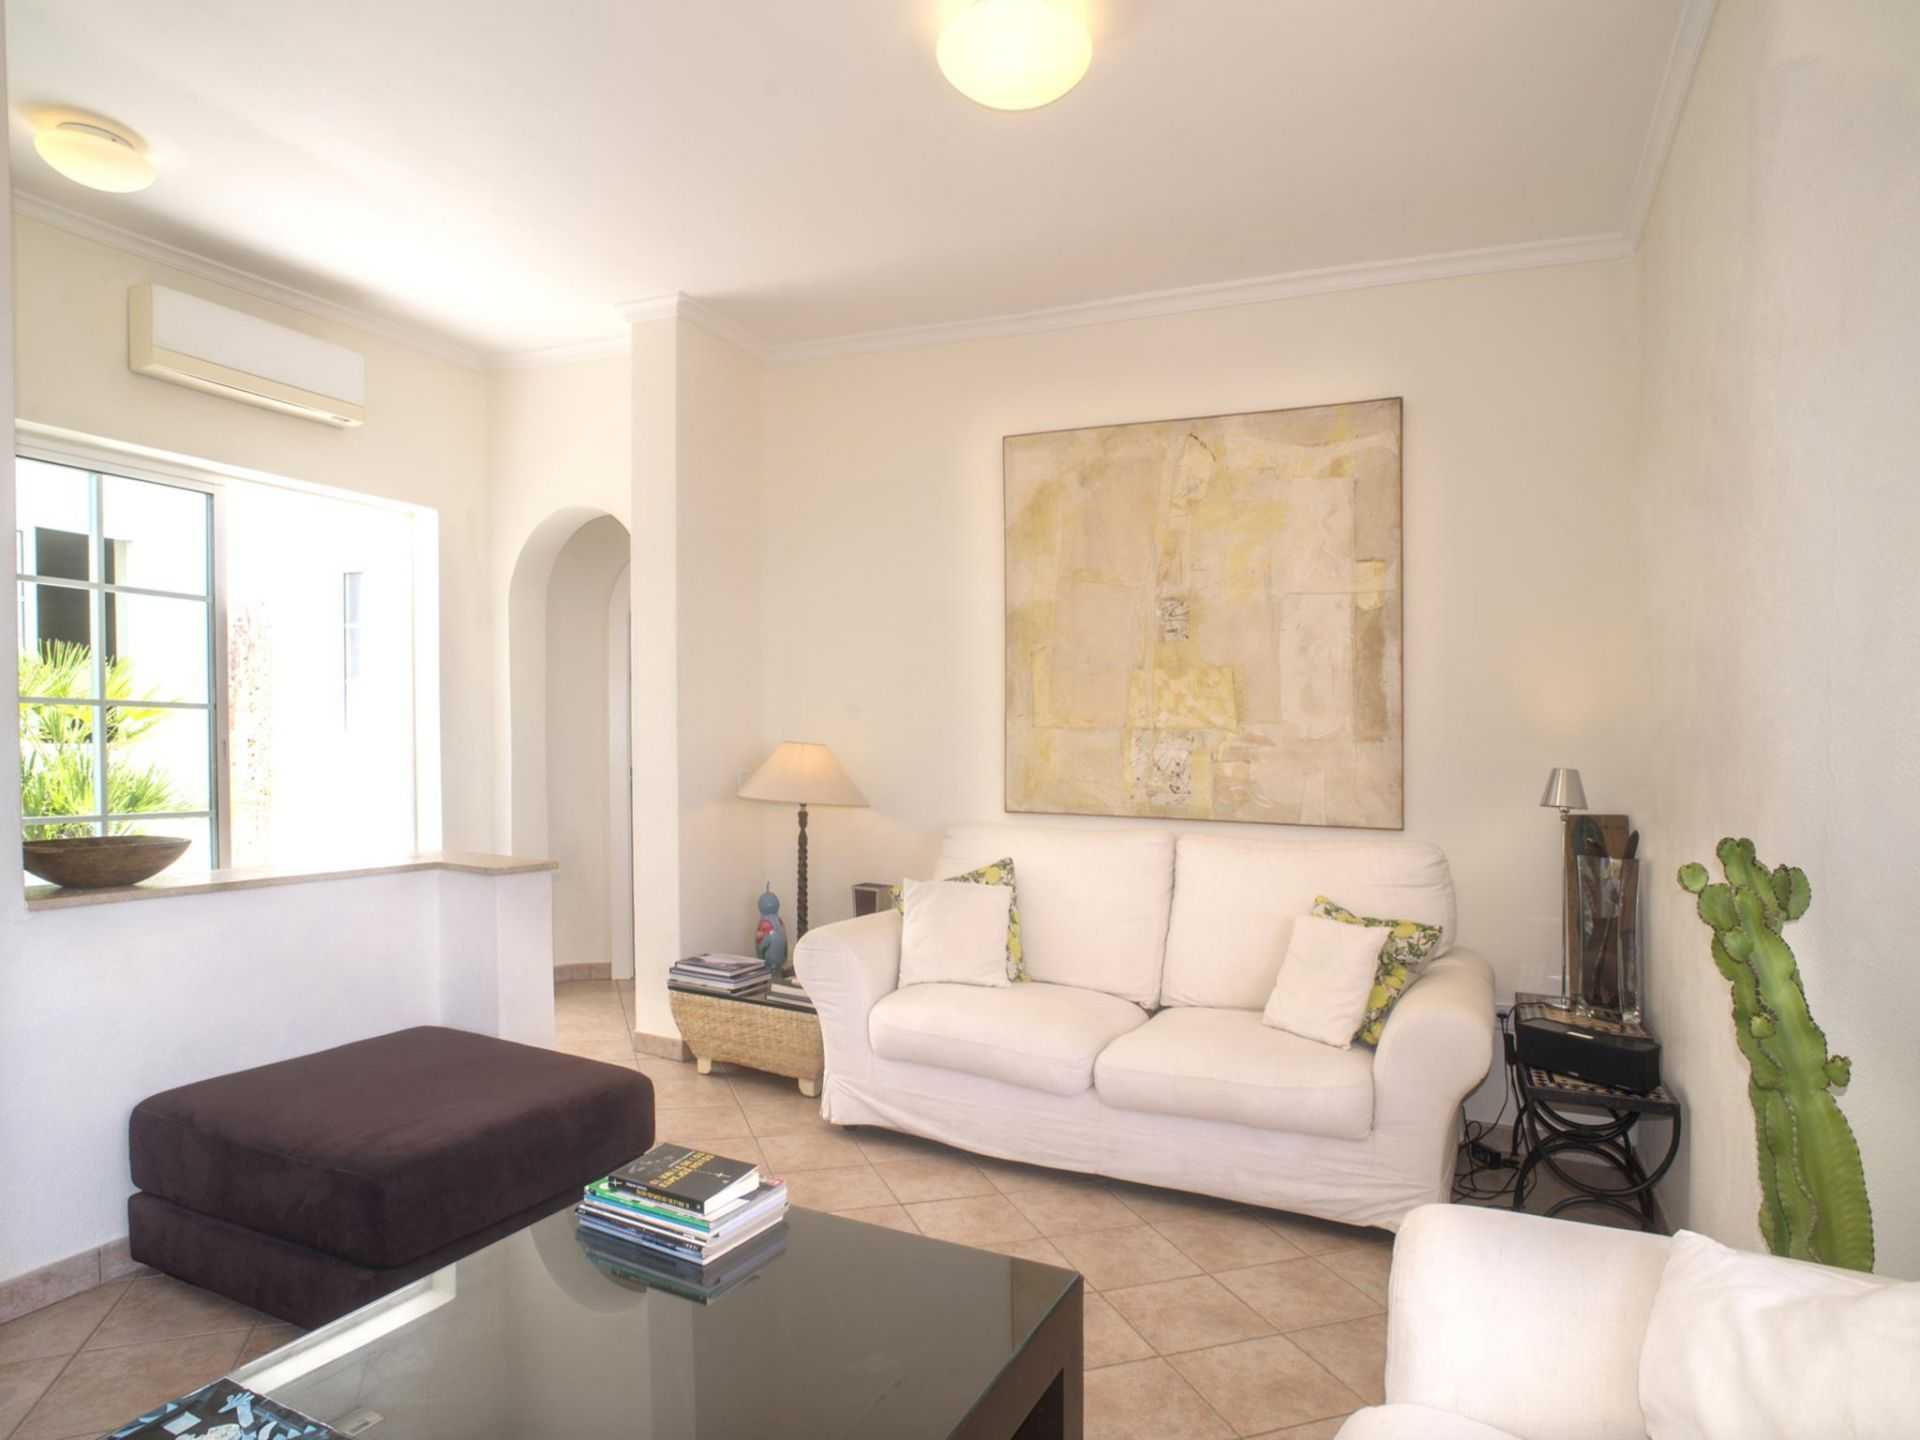 Holiday apartment Villa San Agustin 10 - Holiday Rental (854295), Maspalomas, Gran Canaria, Canary Islands, Spain, picture 12